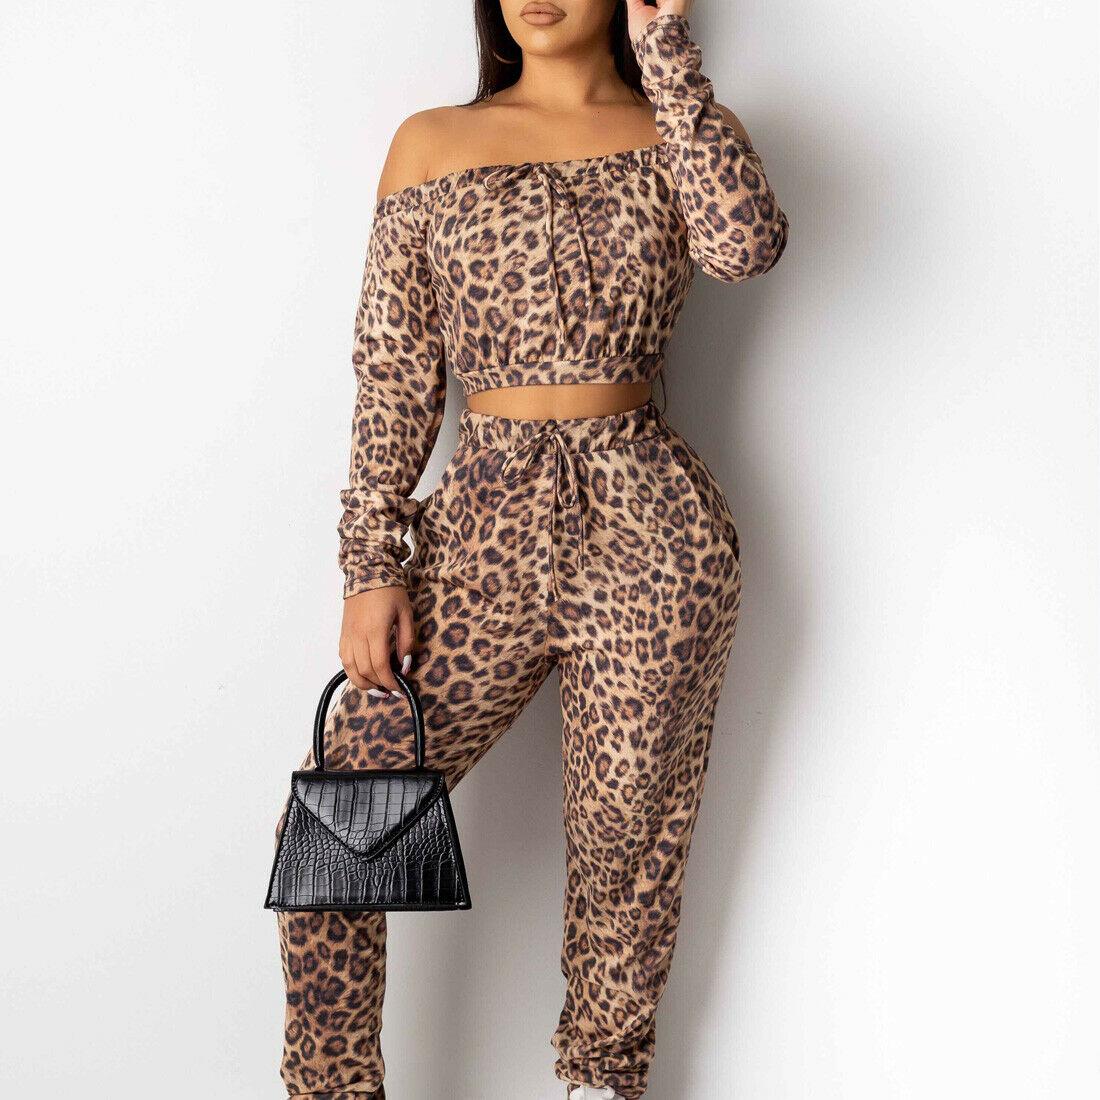 2020 Fashion Trend Women's 2PCS Leopard Tracksuit Crop Tops Long Pants Suit Fitness Long Sleeve Casual Autumn New Outfits